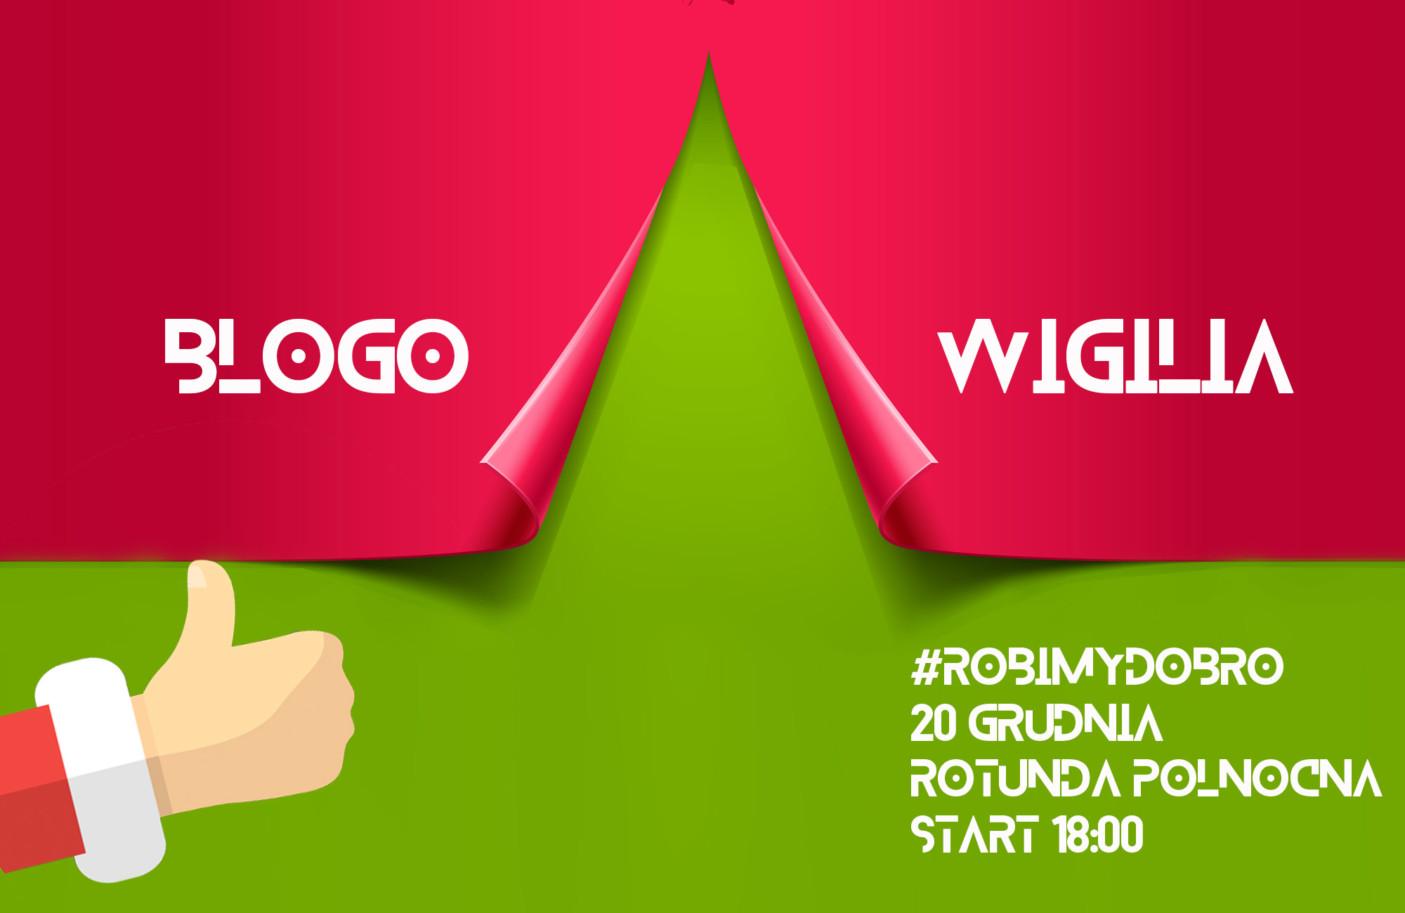 blogowigilia-blog-szczecin